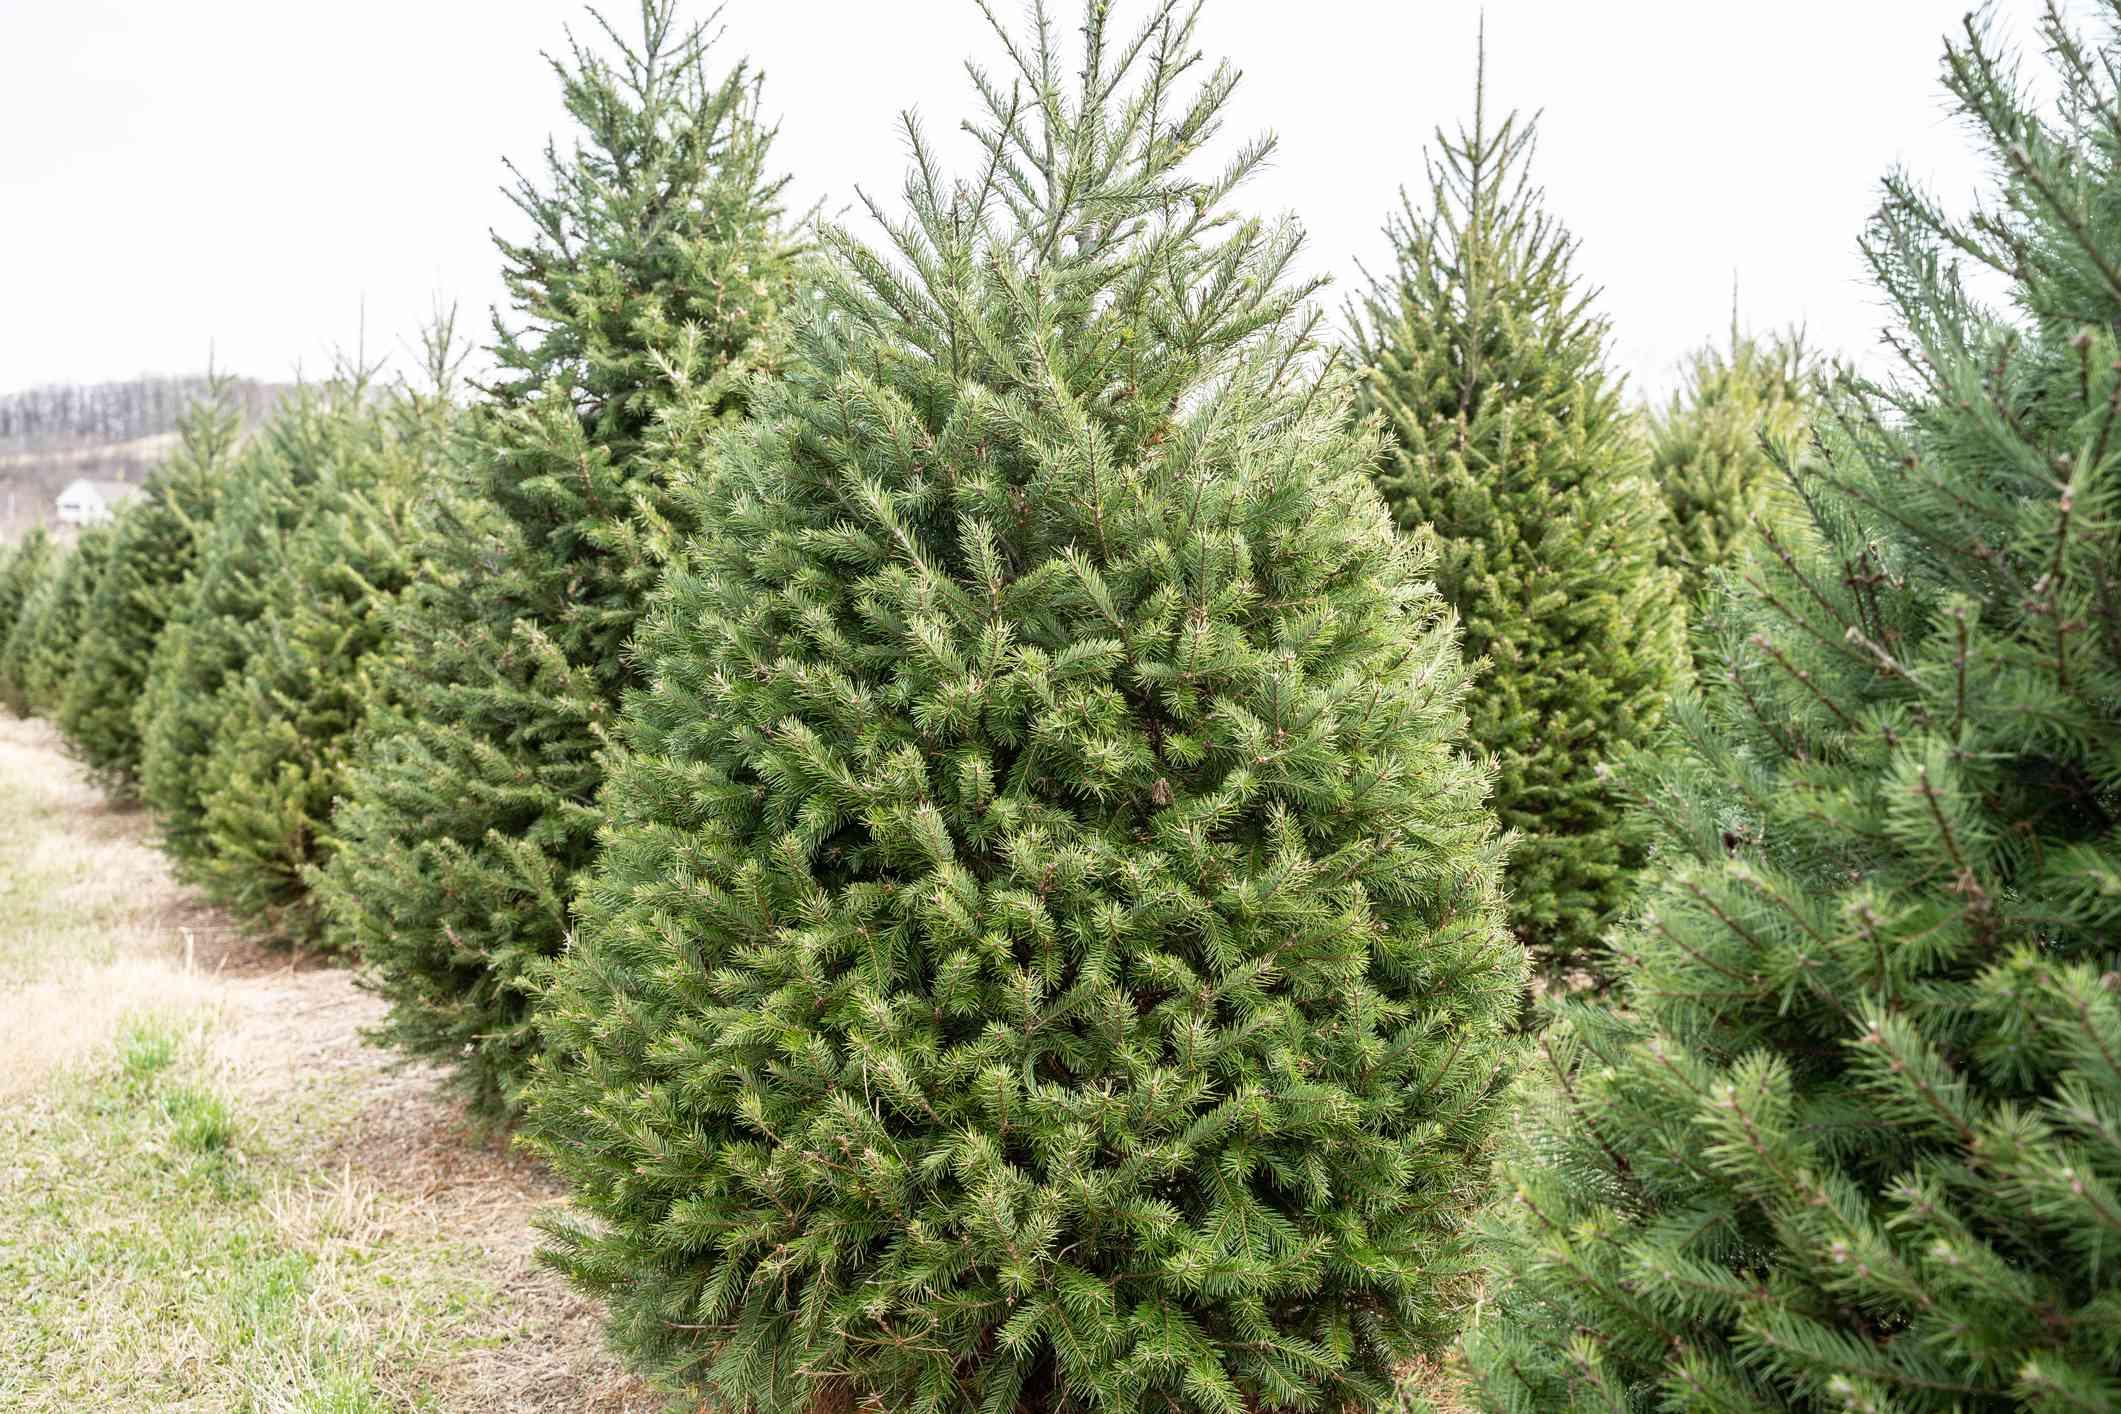 douglas fir christmas trees growing in rows on tree farm